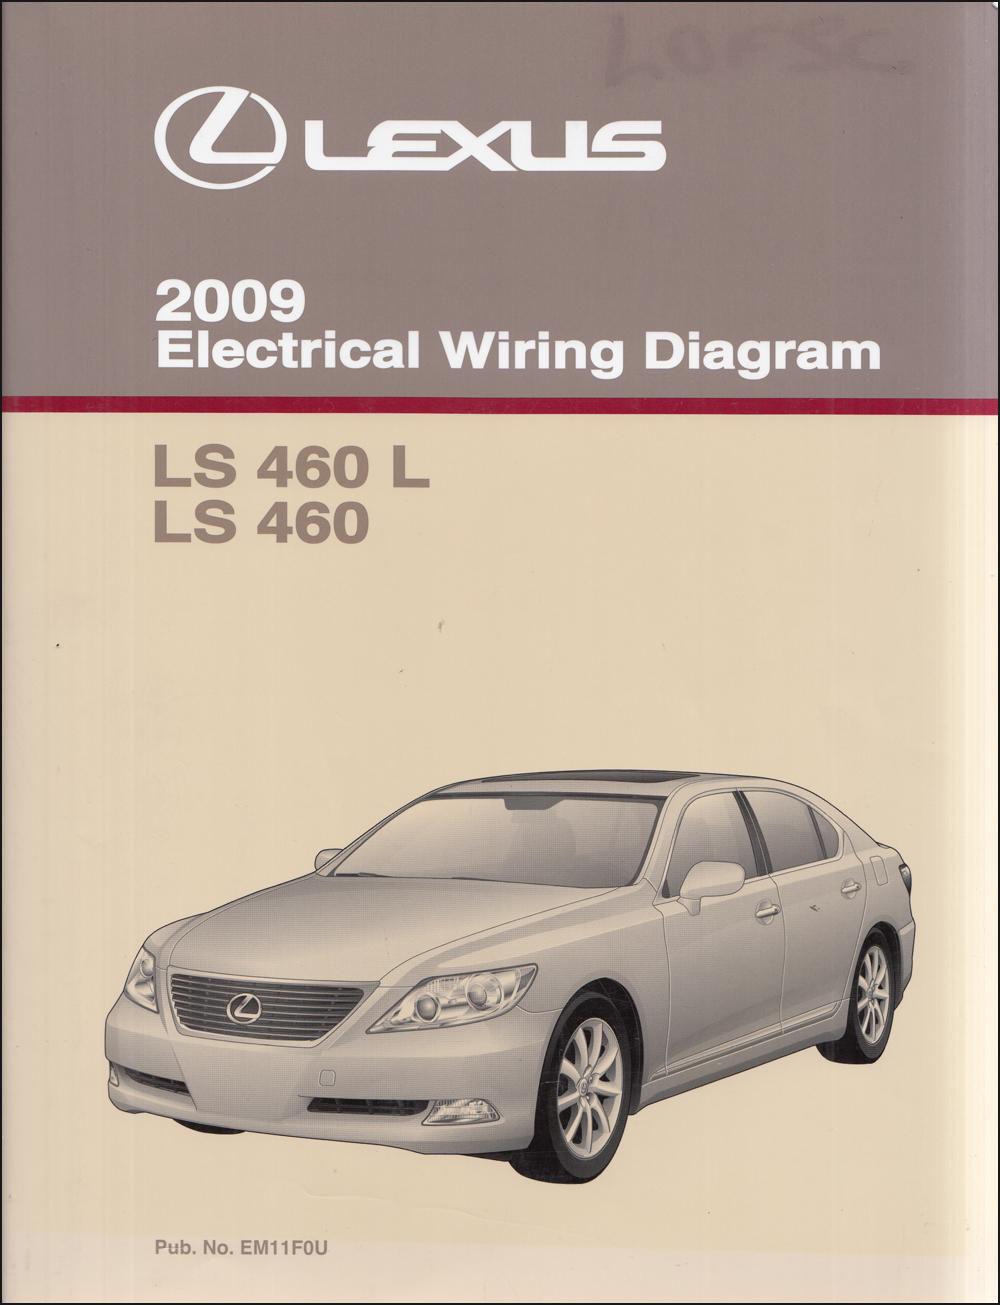 2009 Lexus Ls 460 And Ls460l Wiring Diagram Manual Original